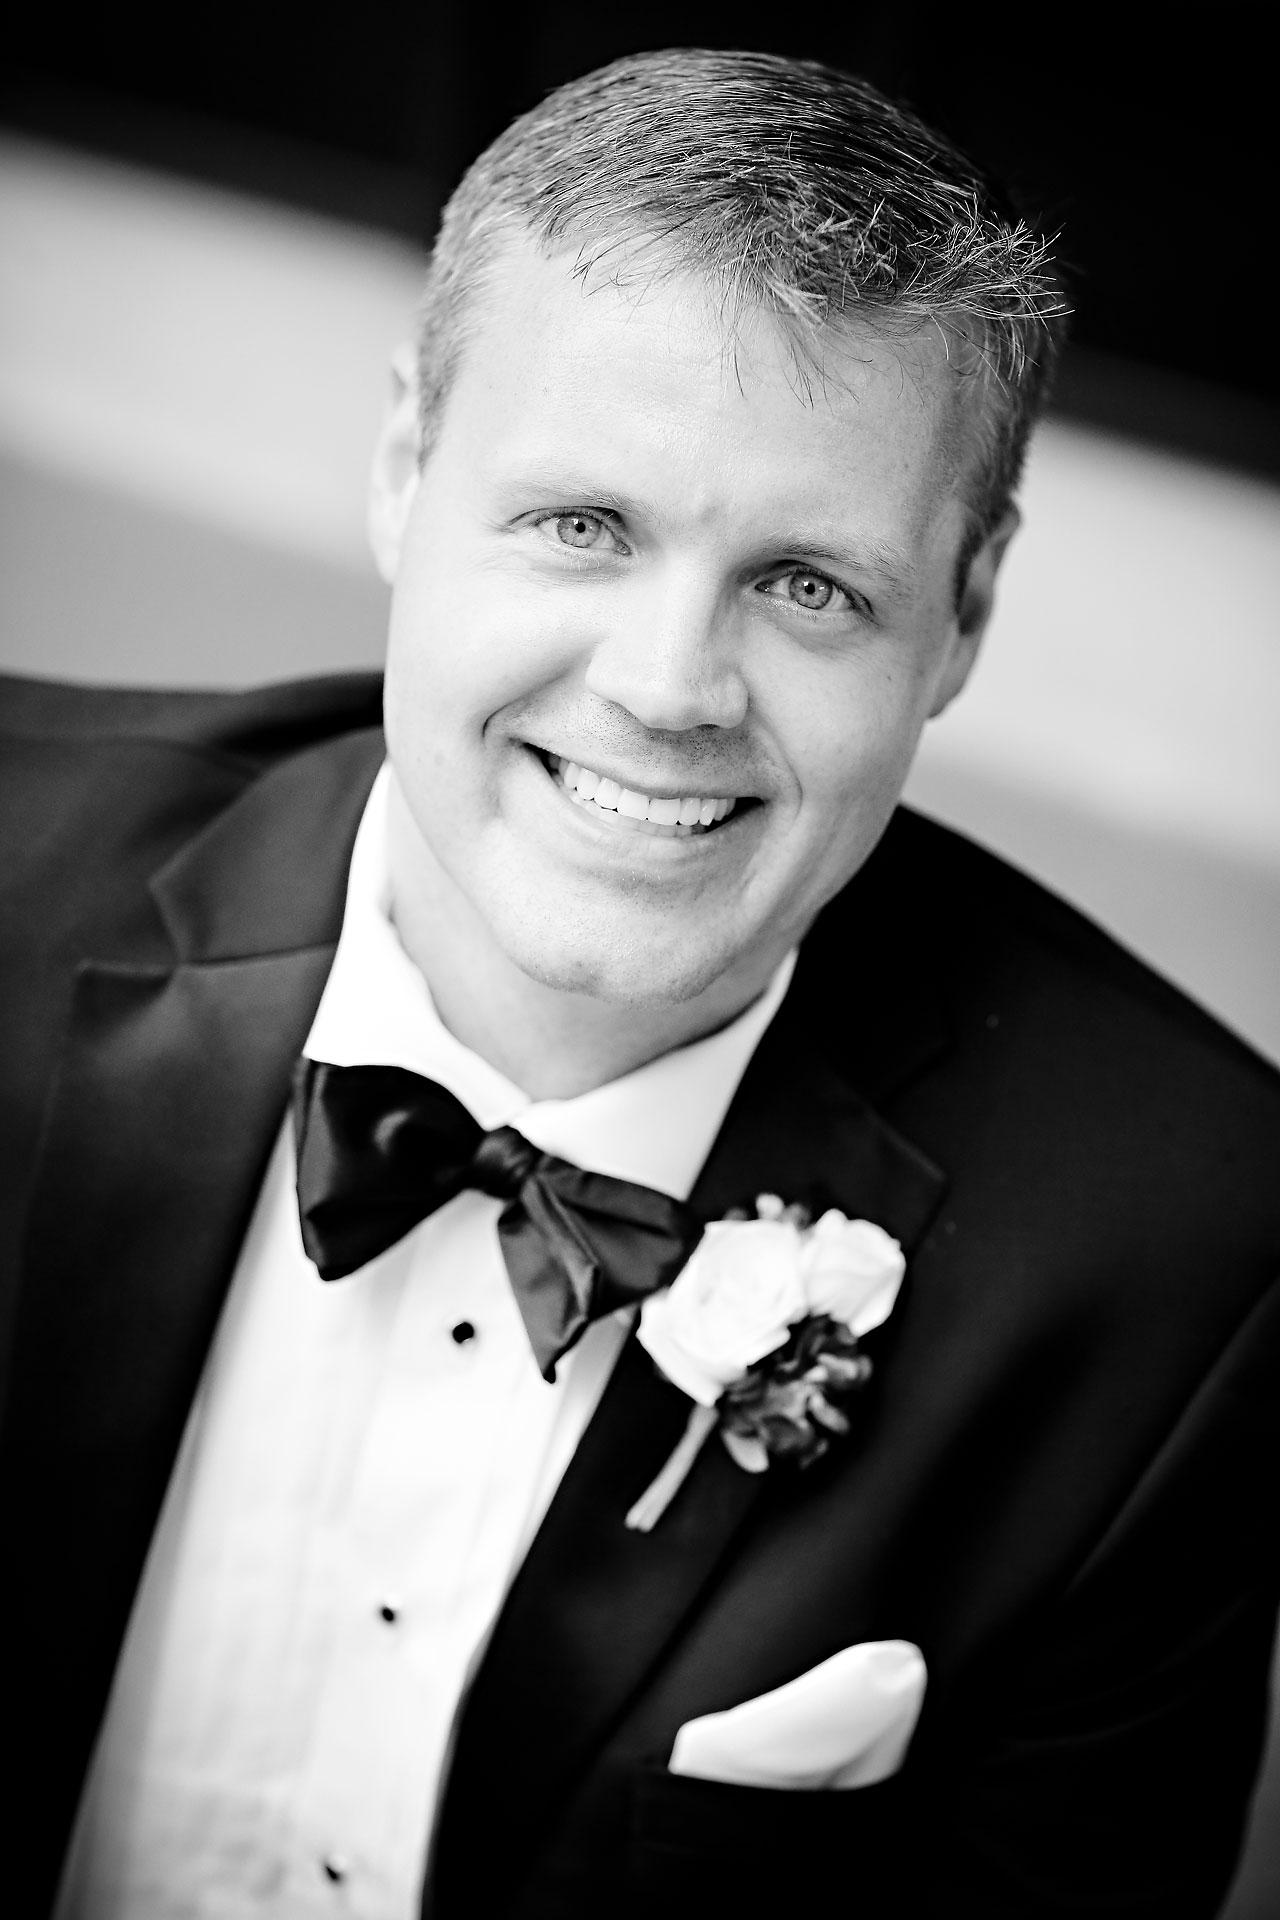 Kelly Brian Scottish Rite Wedding 102